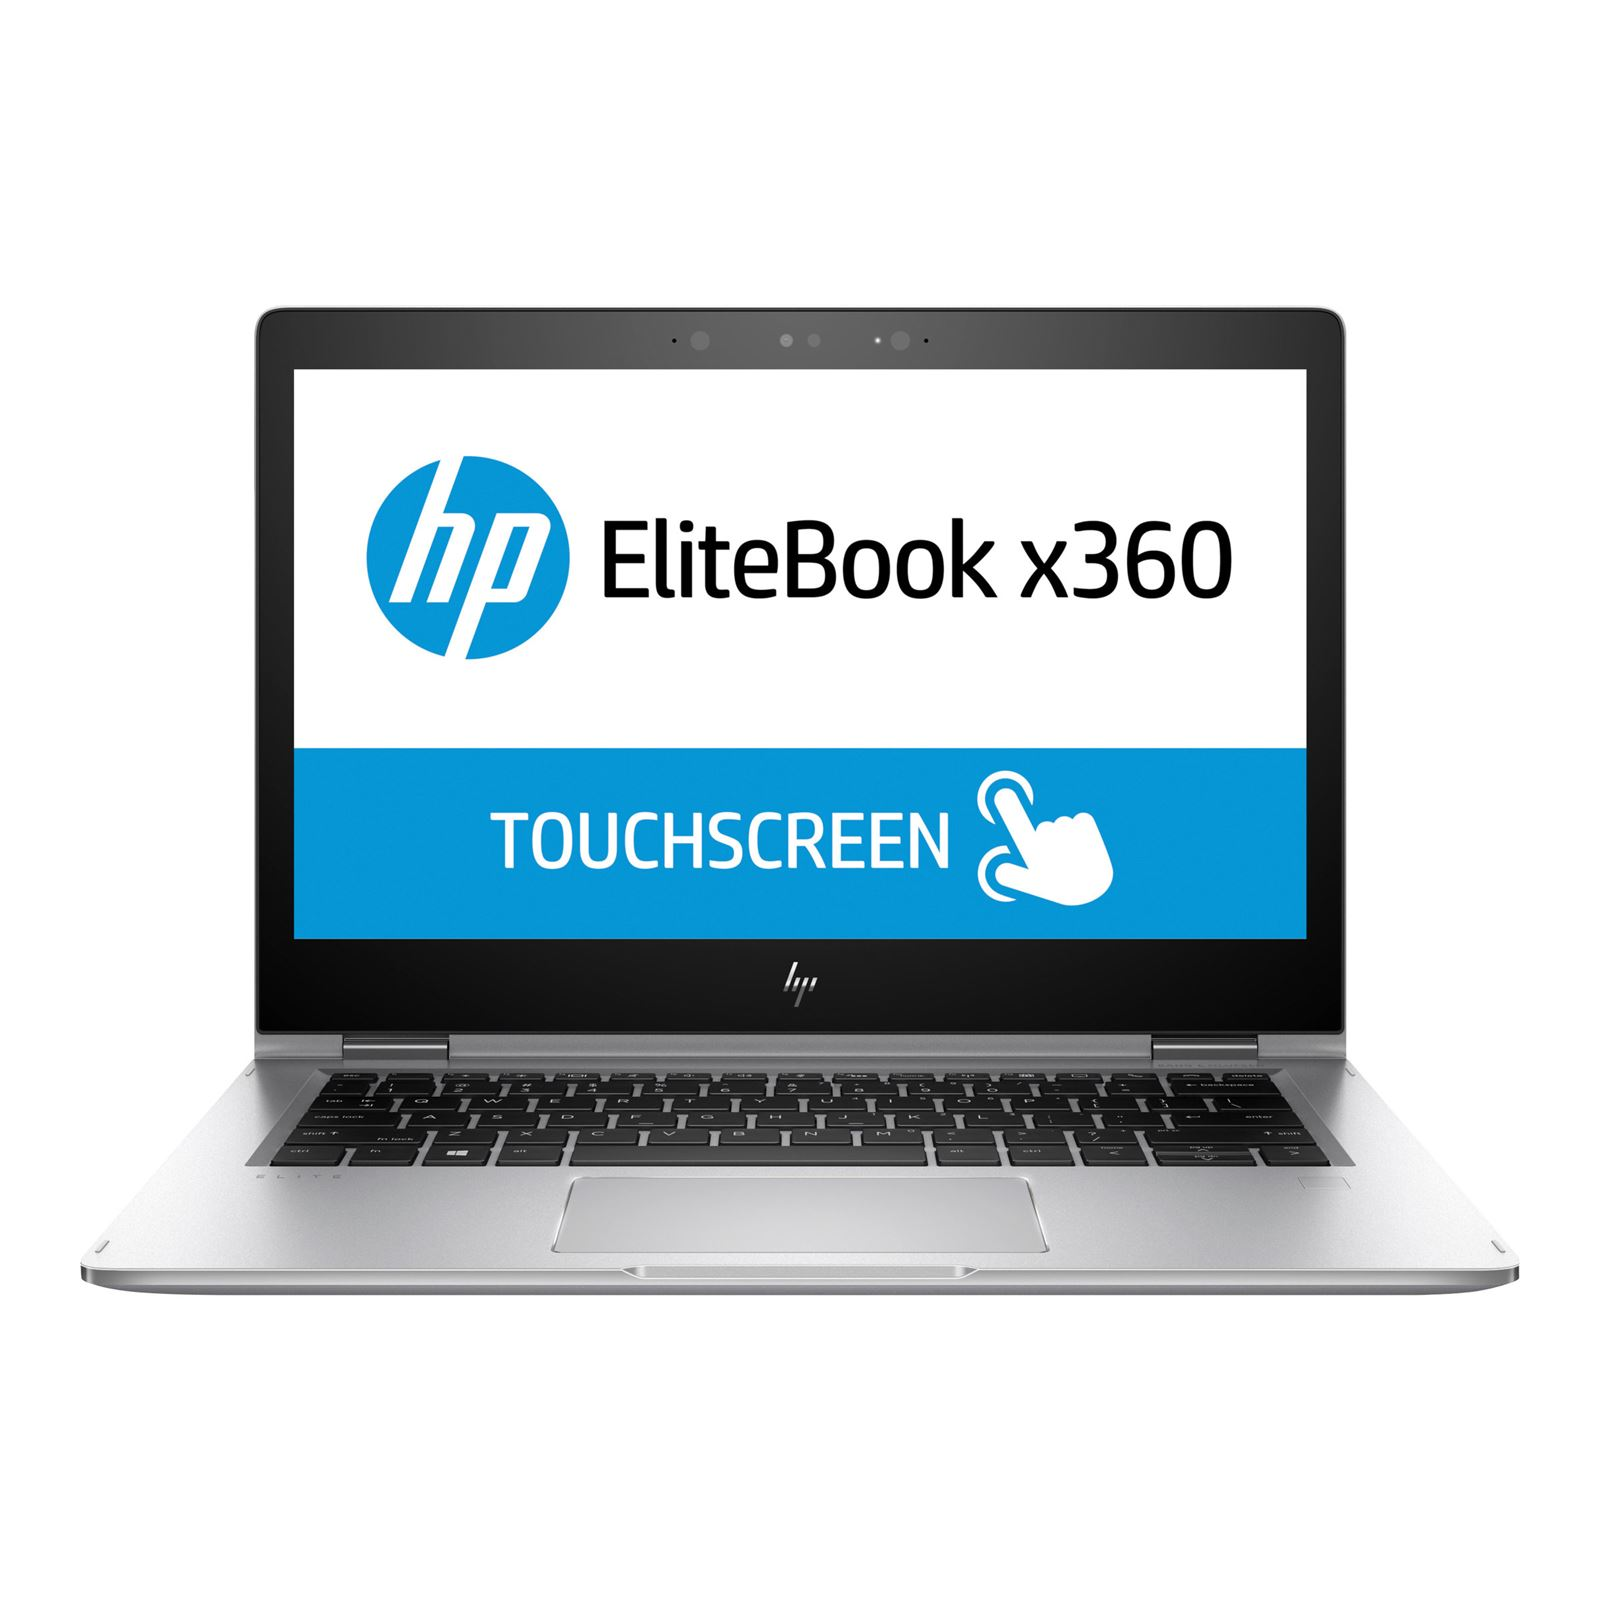 Rabljen prenosnik HP EliteBook x360 1030 G2 / i7 / RAM 8 GB / SSD Disk / 13,3″ / FHD